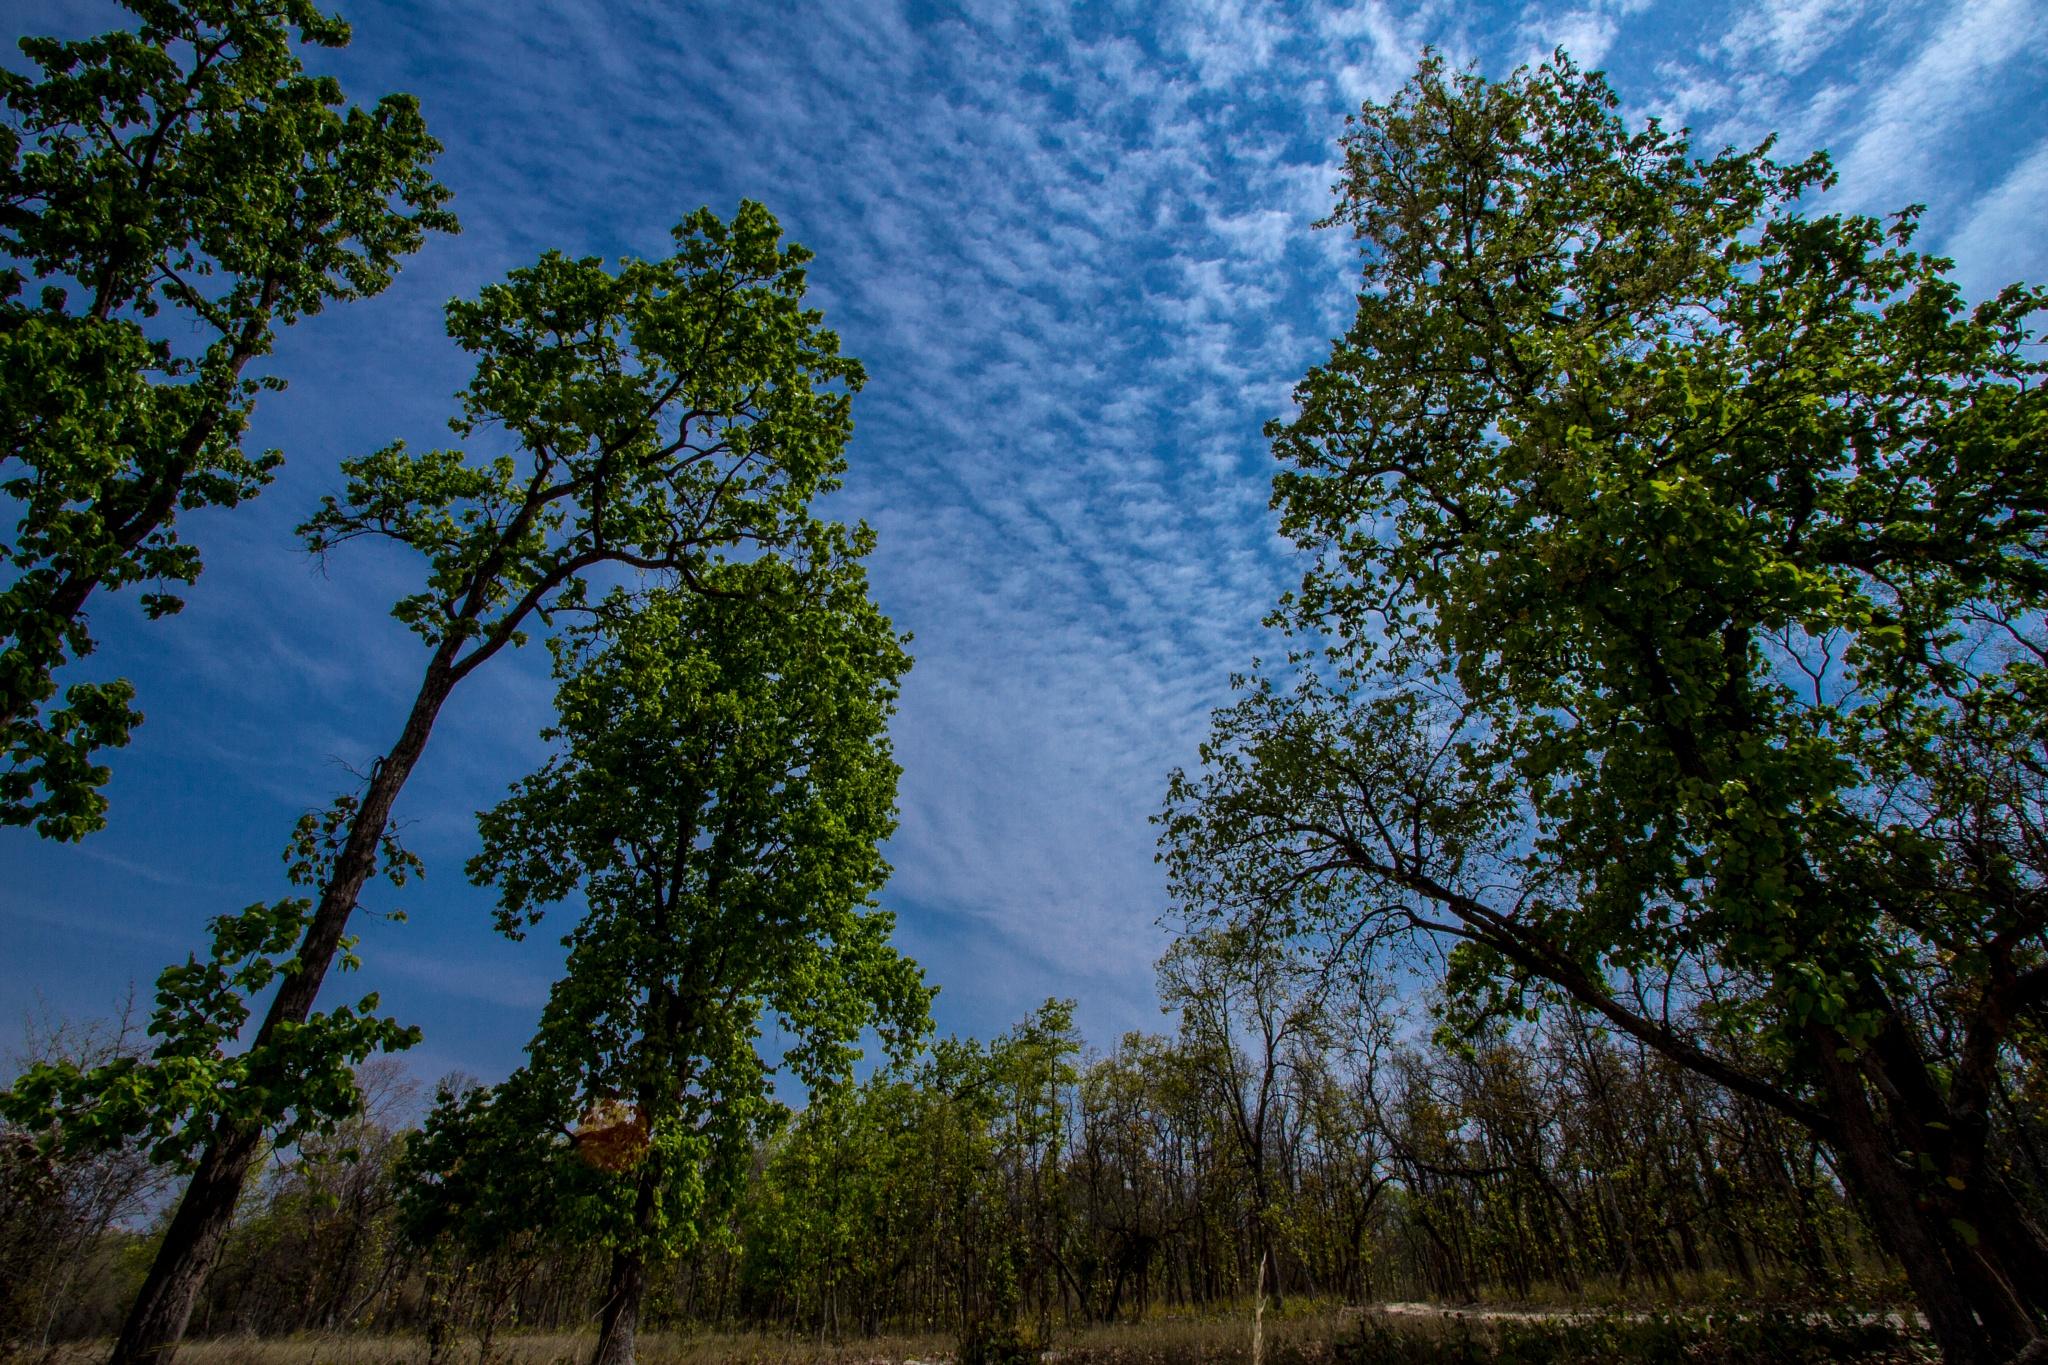 Reach the skies by Monish kumar